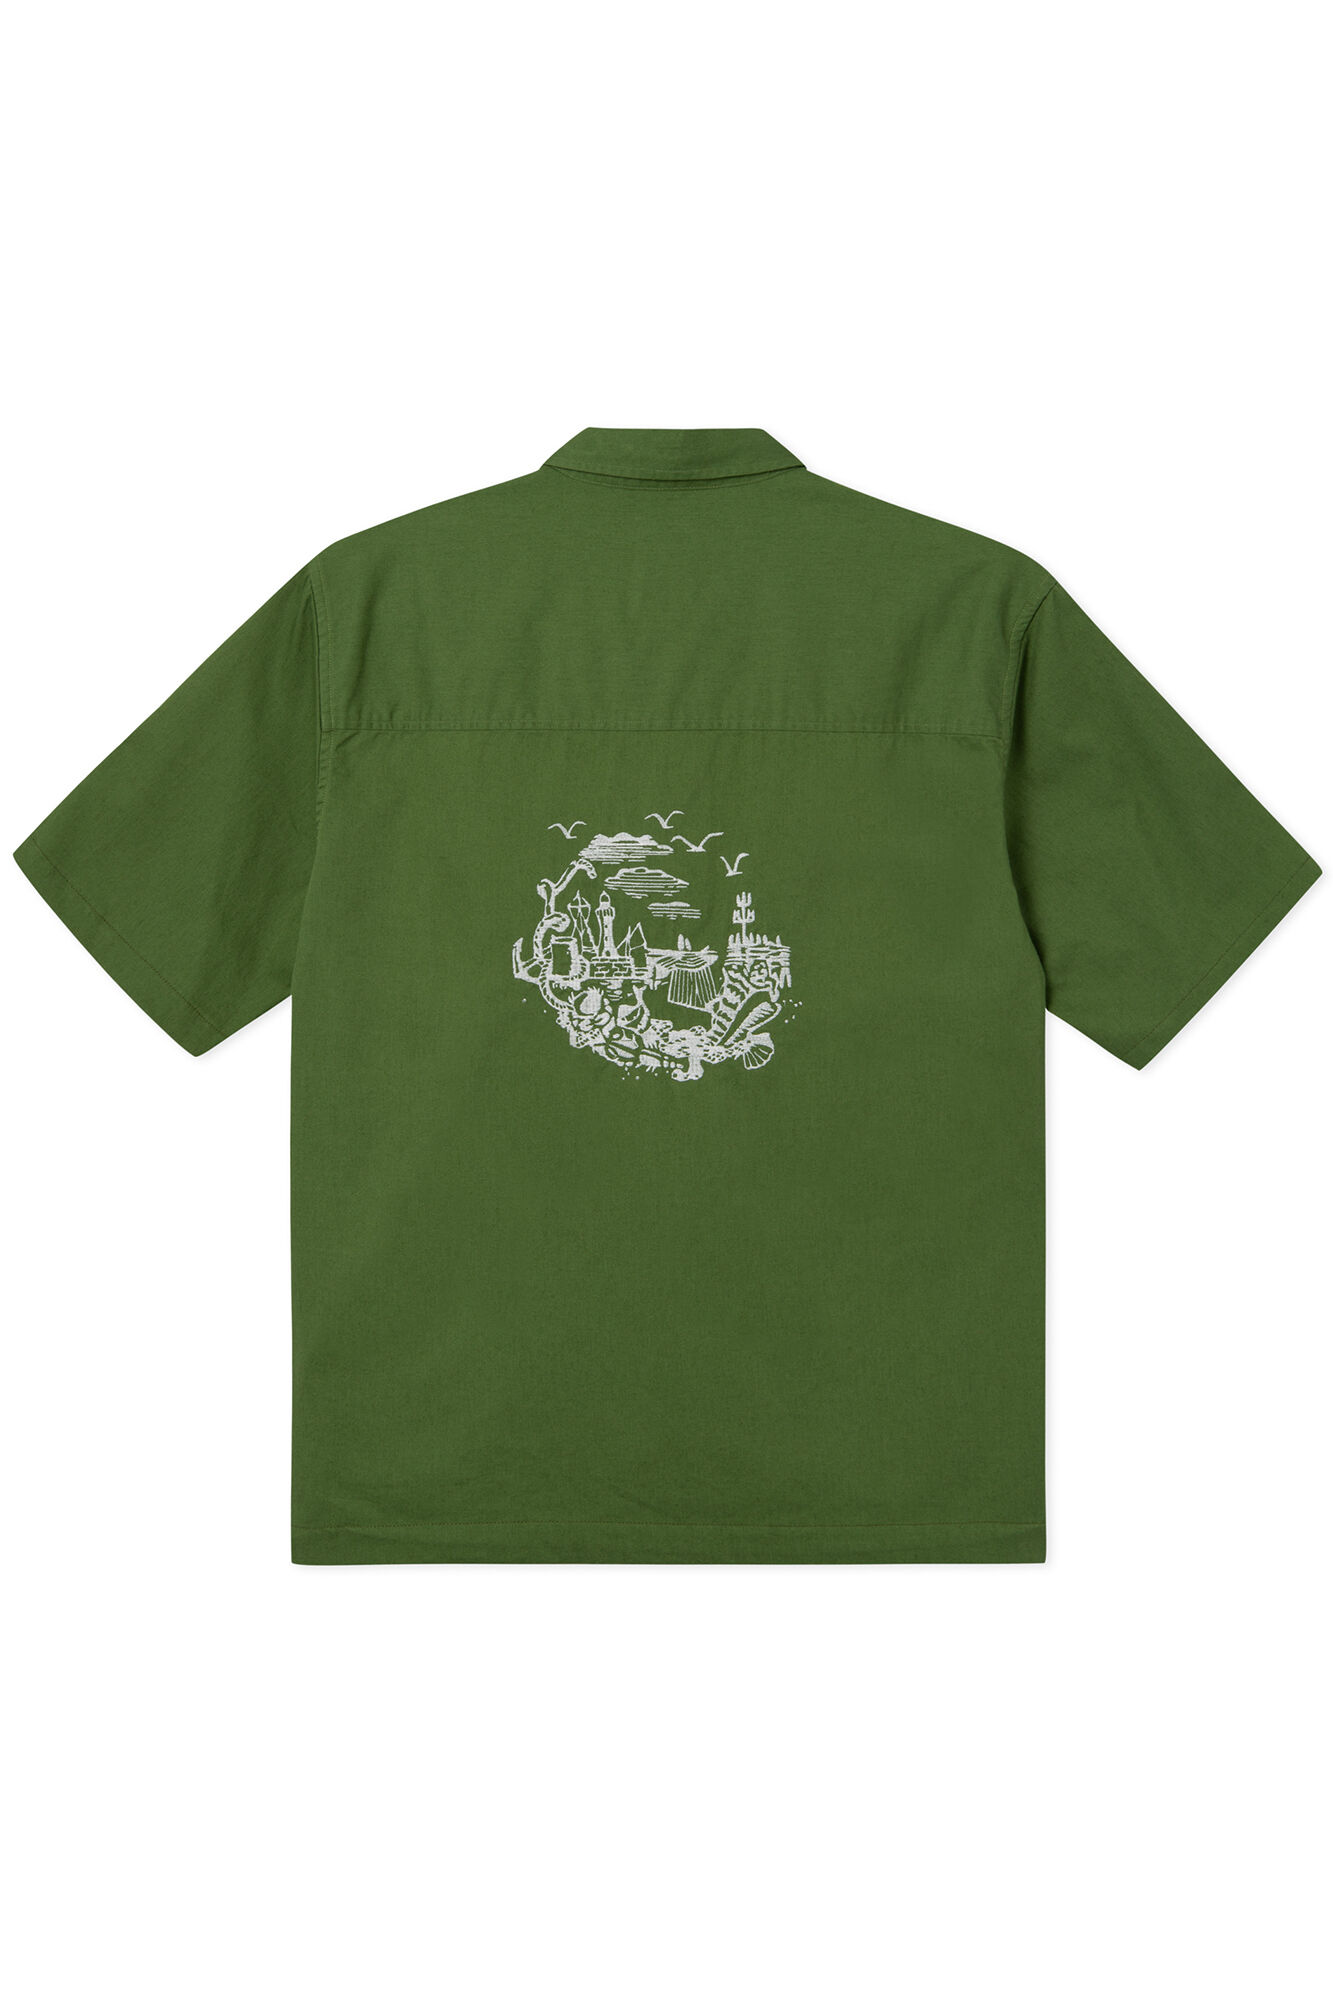 Thor shirt 11915313-1151, GREEN